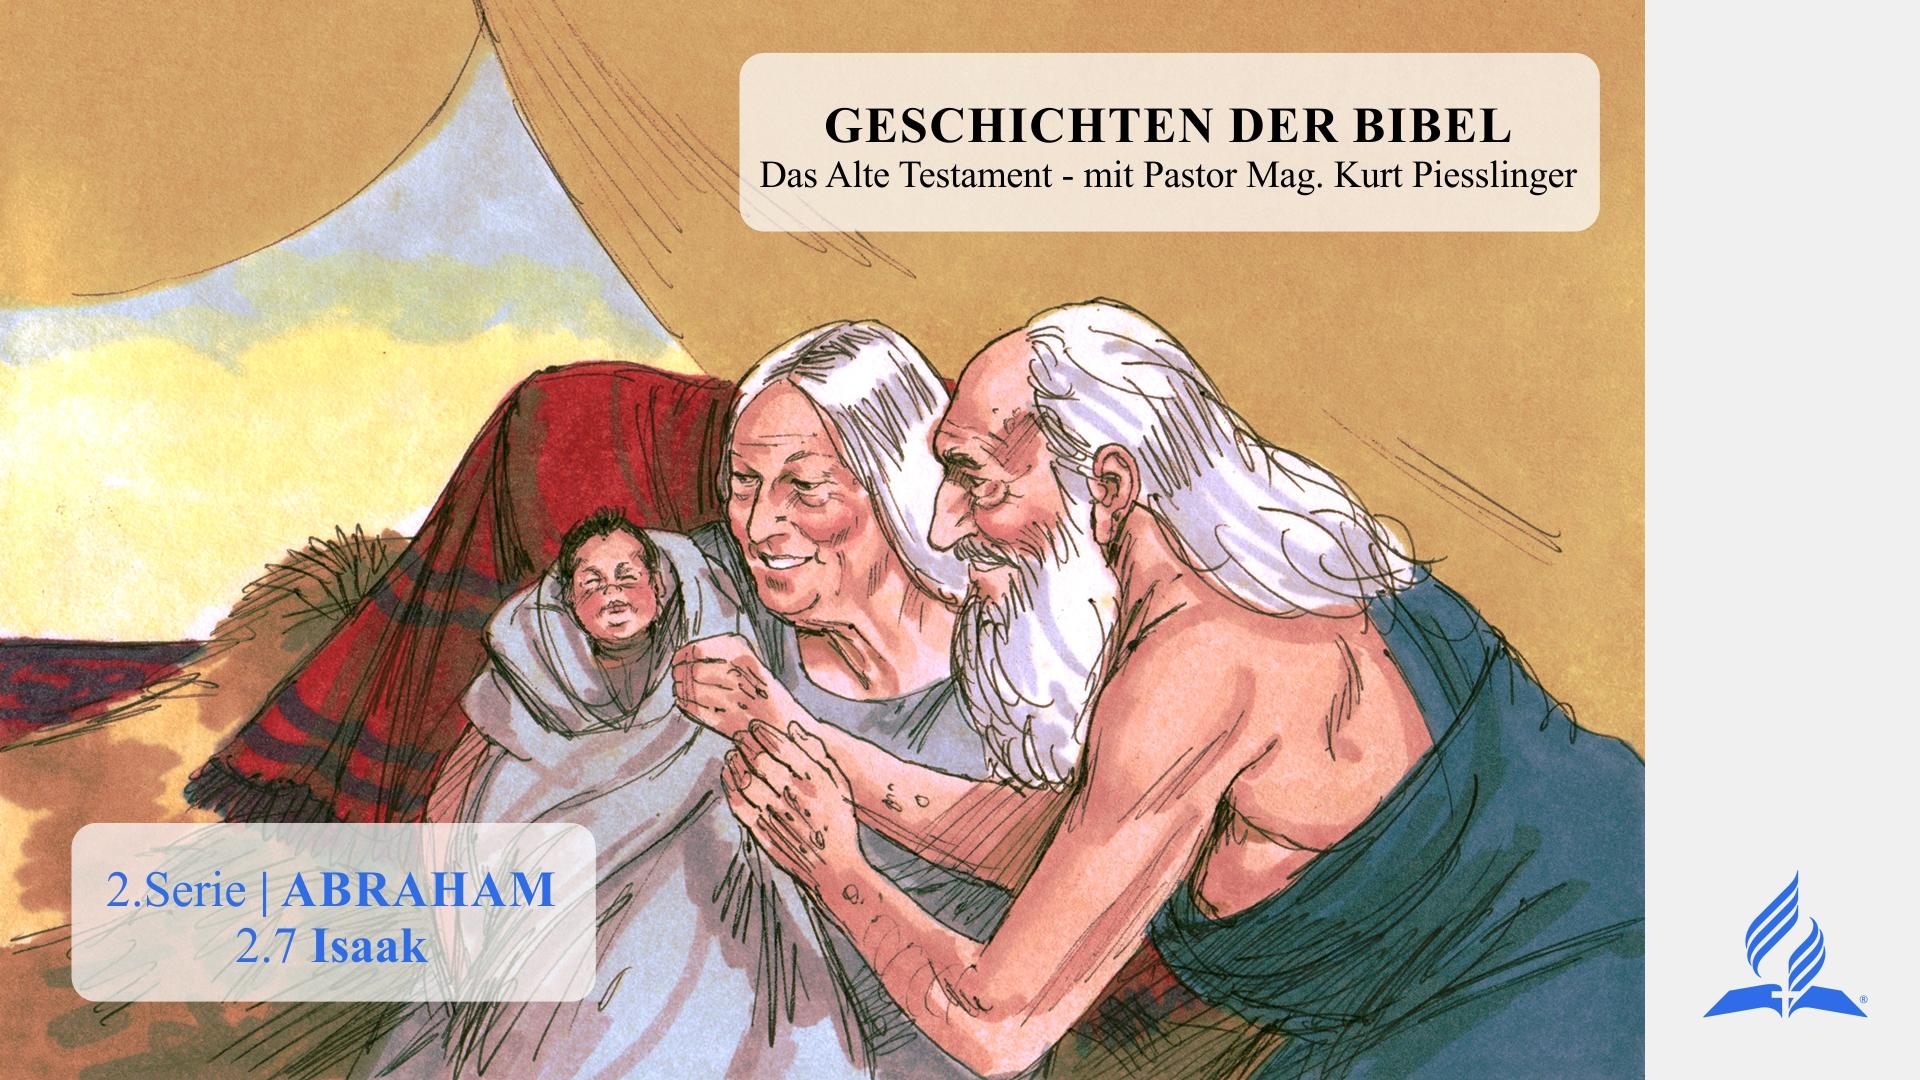 GESCHICHTEN DER BIBEL: 2.7 Isaak – 2.ABRAHAM | Pastor Mag. Kurt Piesslinger